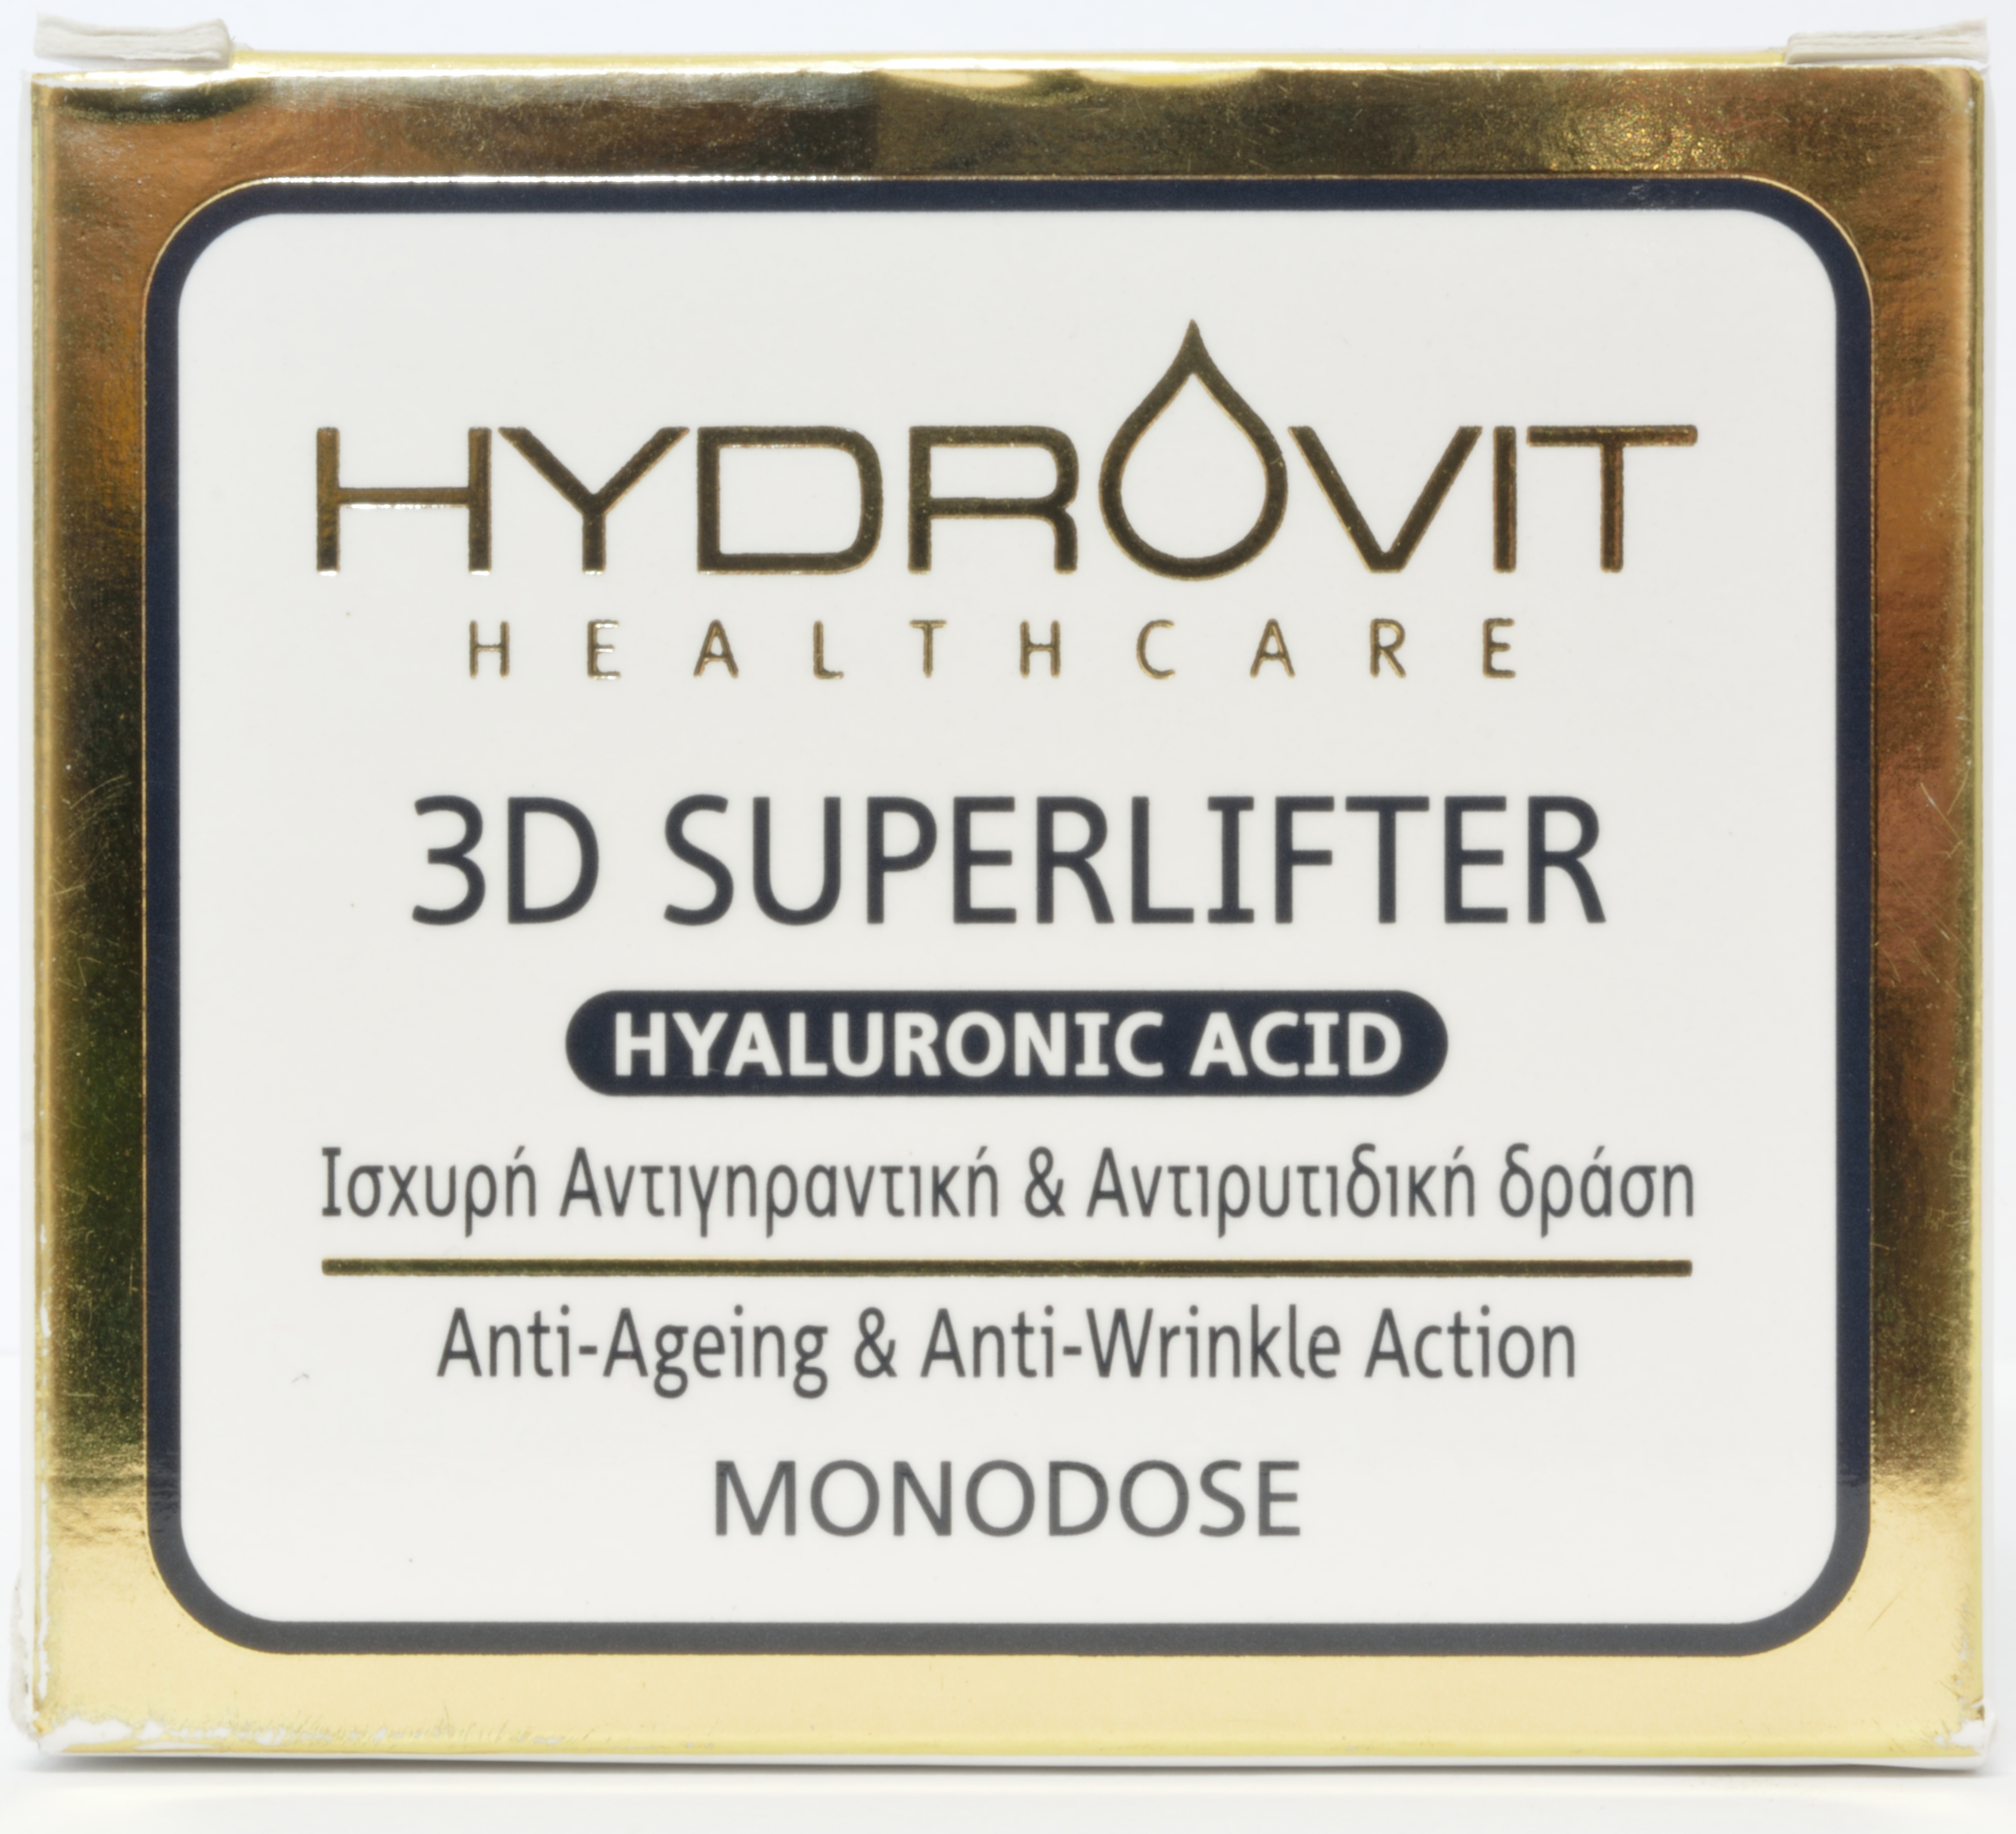 Hydrovit Hyaluronic Acid 3D Superlifter Ισχυρή Αντιγηραντική & Αντιρυτιδική Δράση Υψηλής Τεχνολογίας 60monodoses